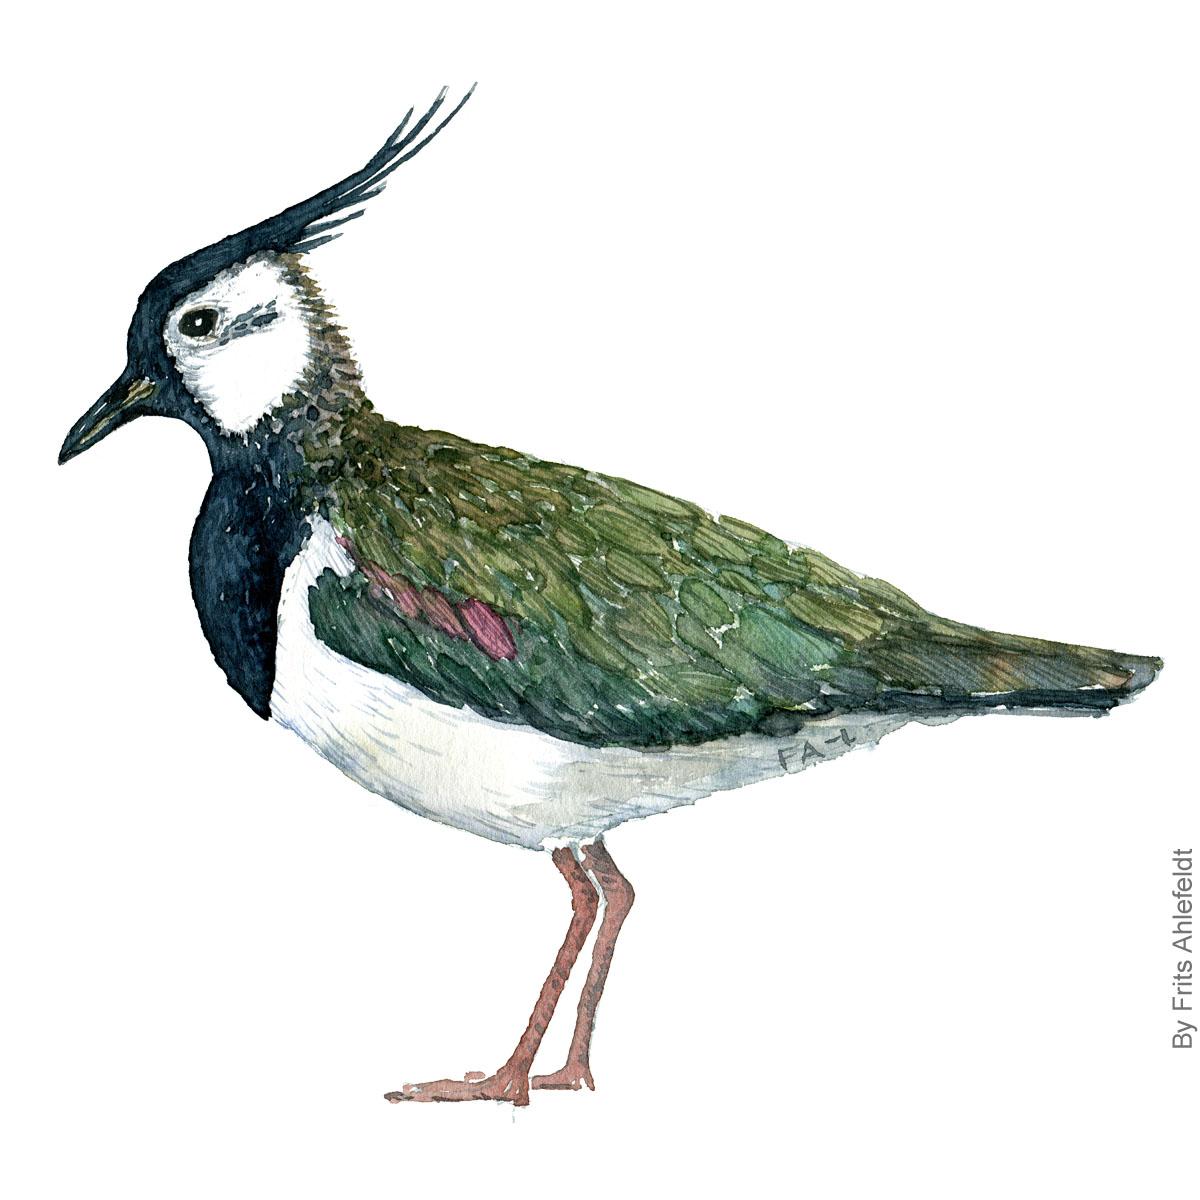 Vibe - Northern Lapving bird watercolor painting. Artwork by Frits Ahlefeldt. Fugle akvarel